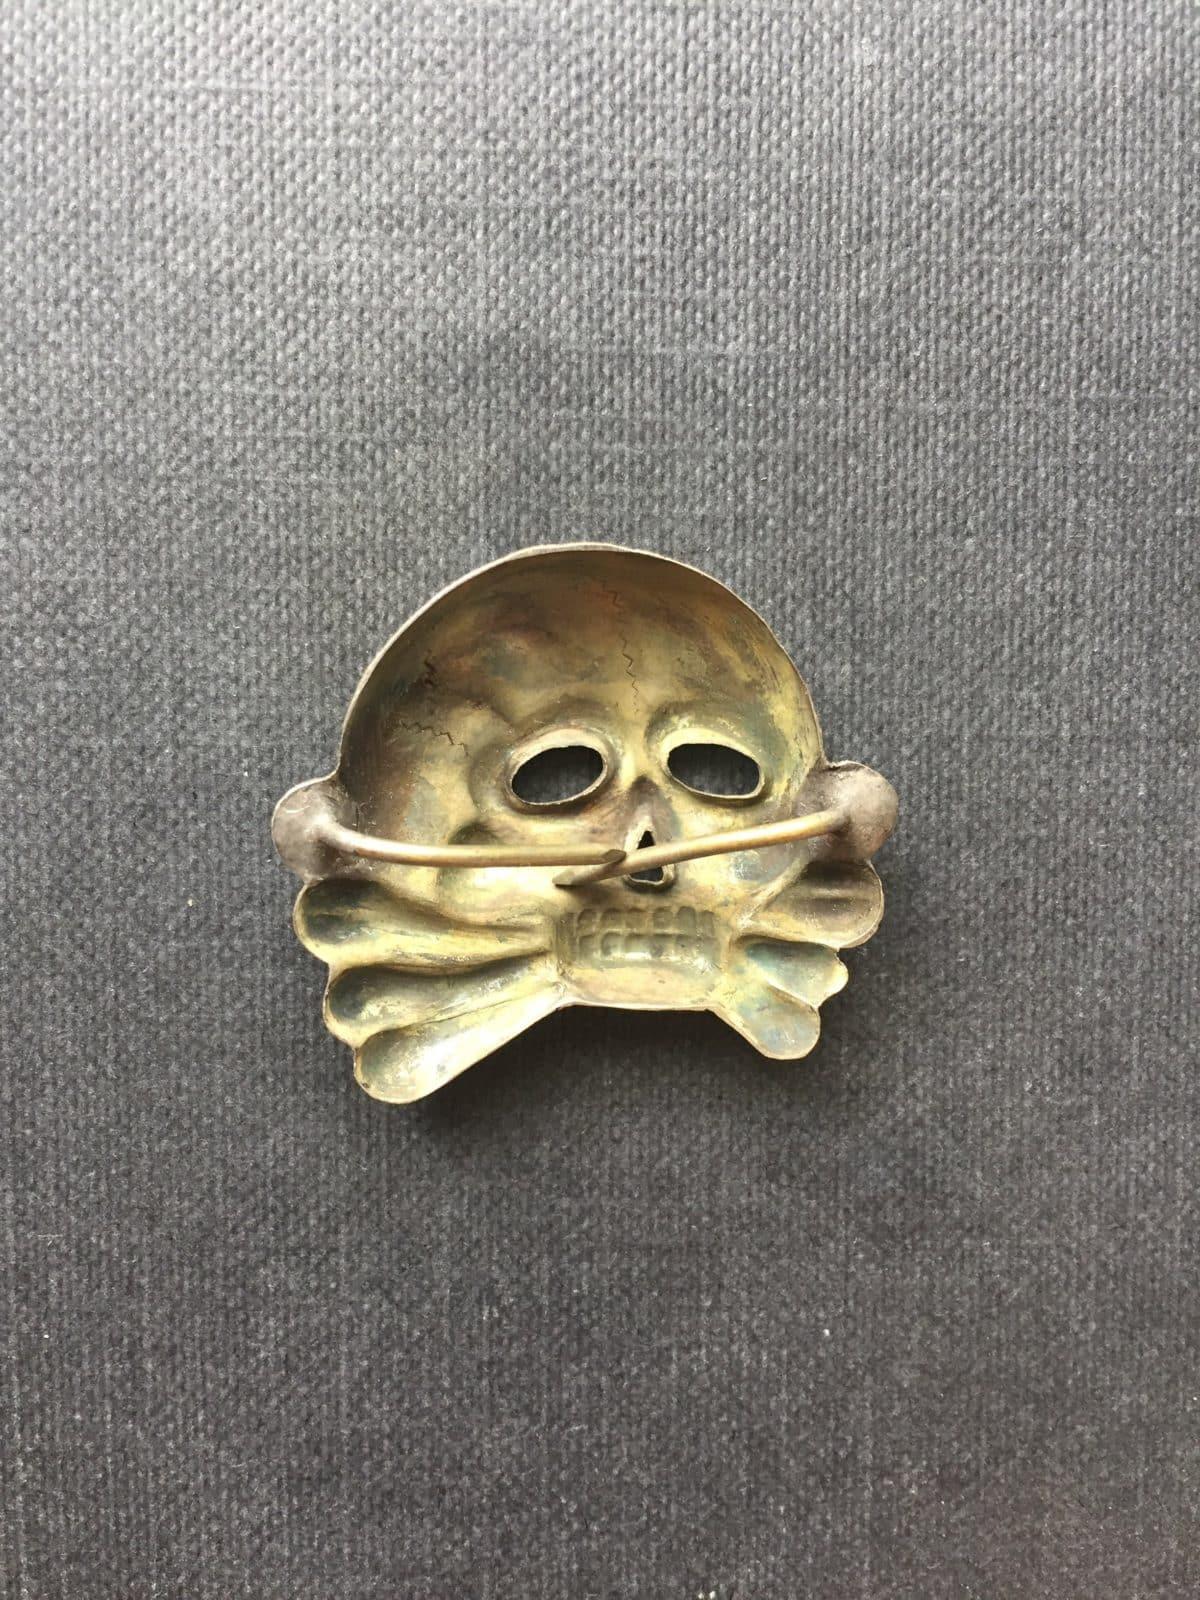 Hoard Find First Pattern SS Cap Skull Badge 100% Original